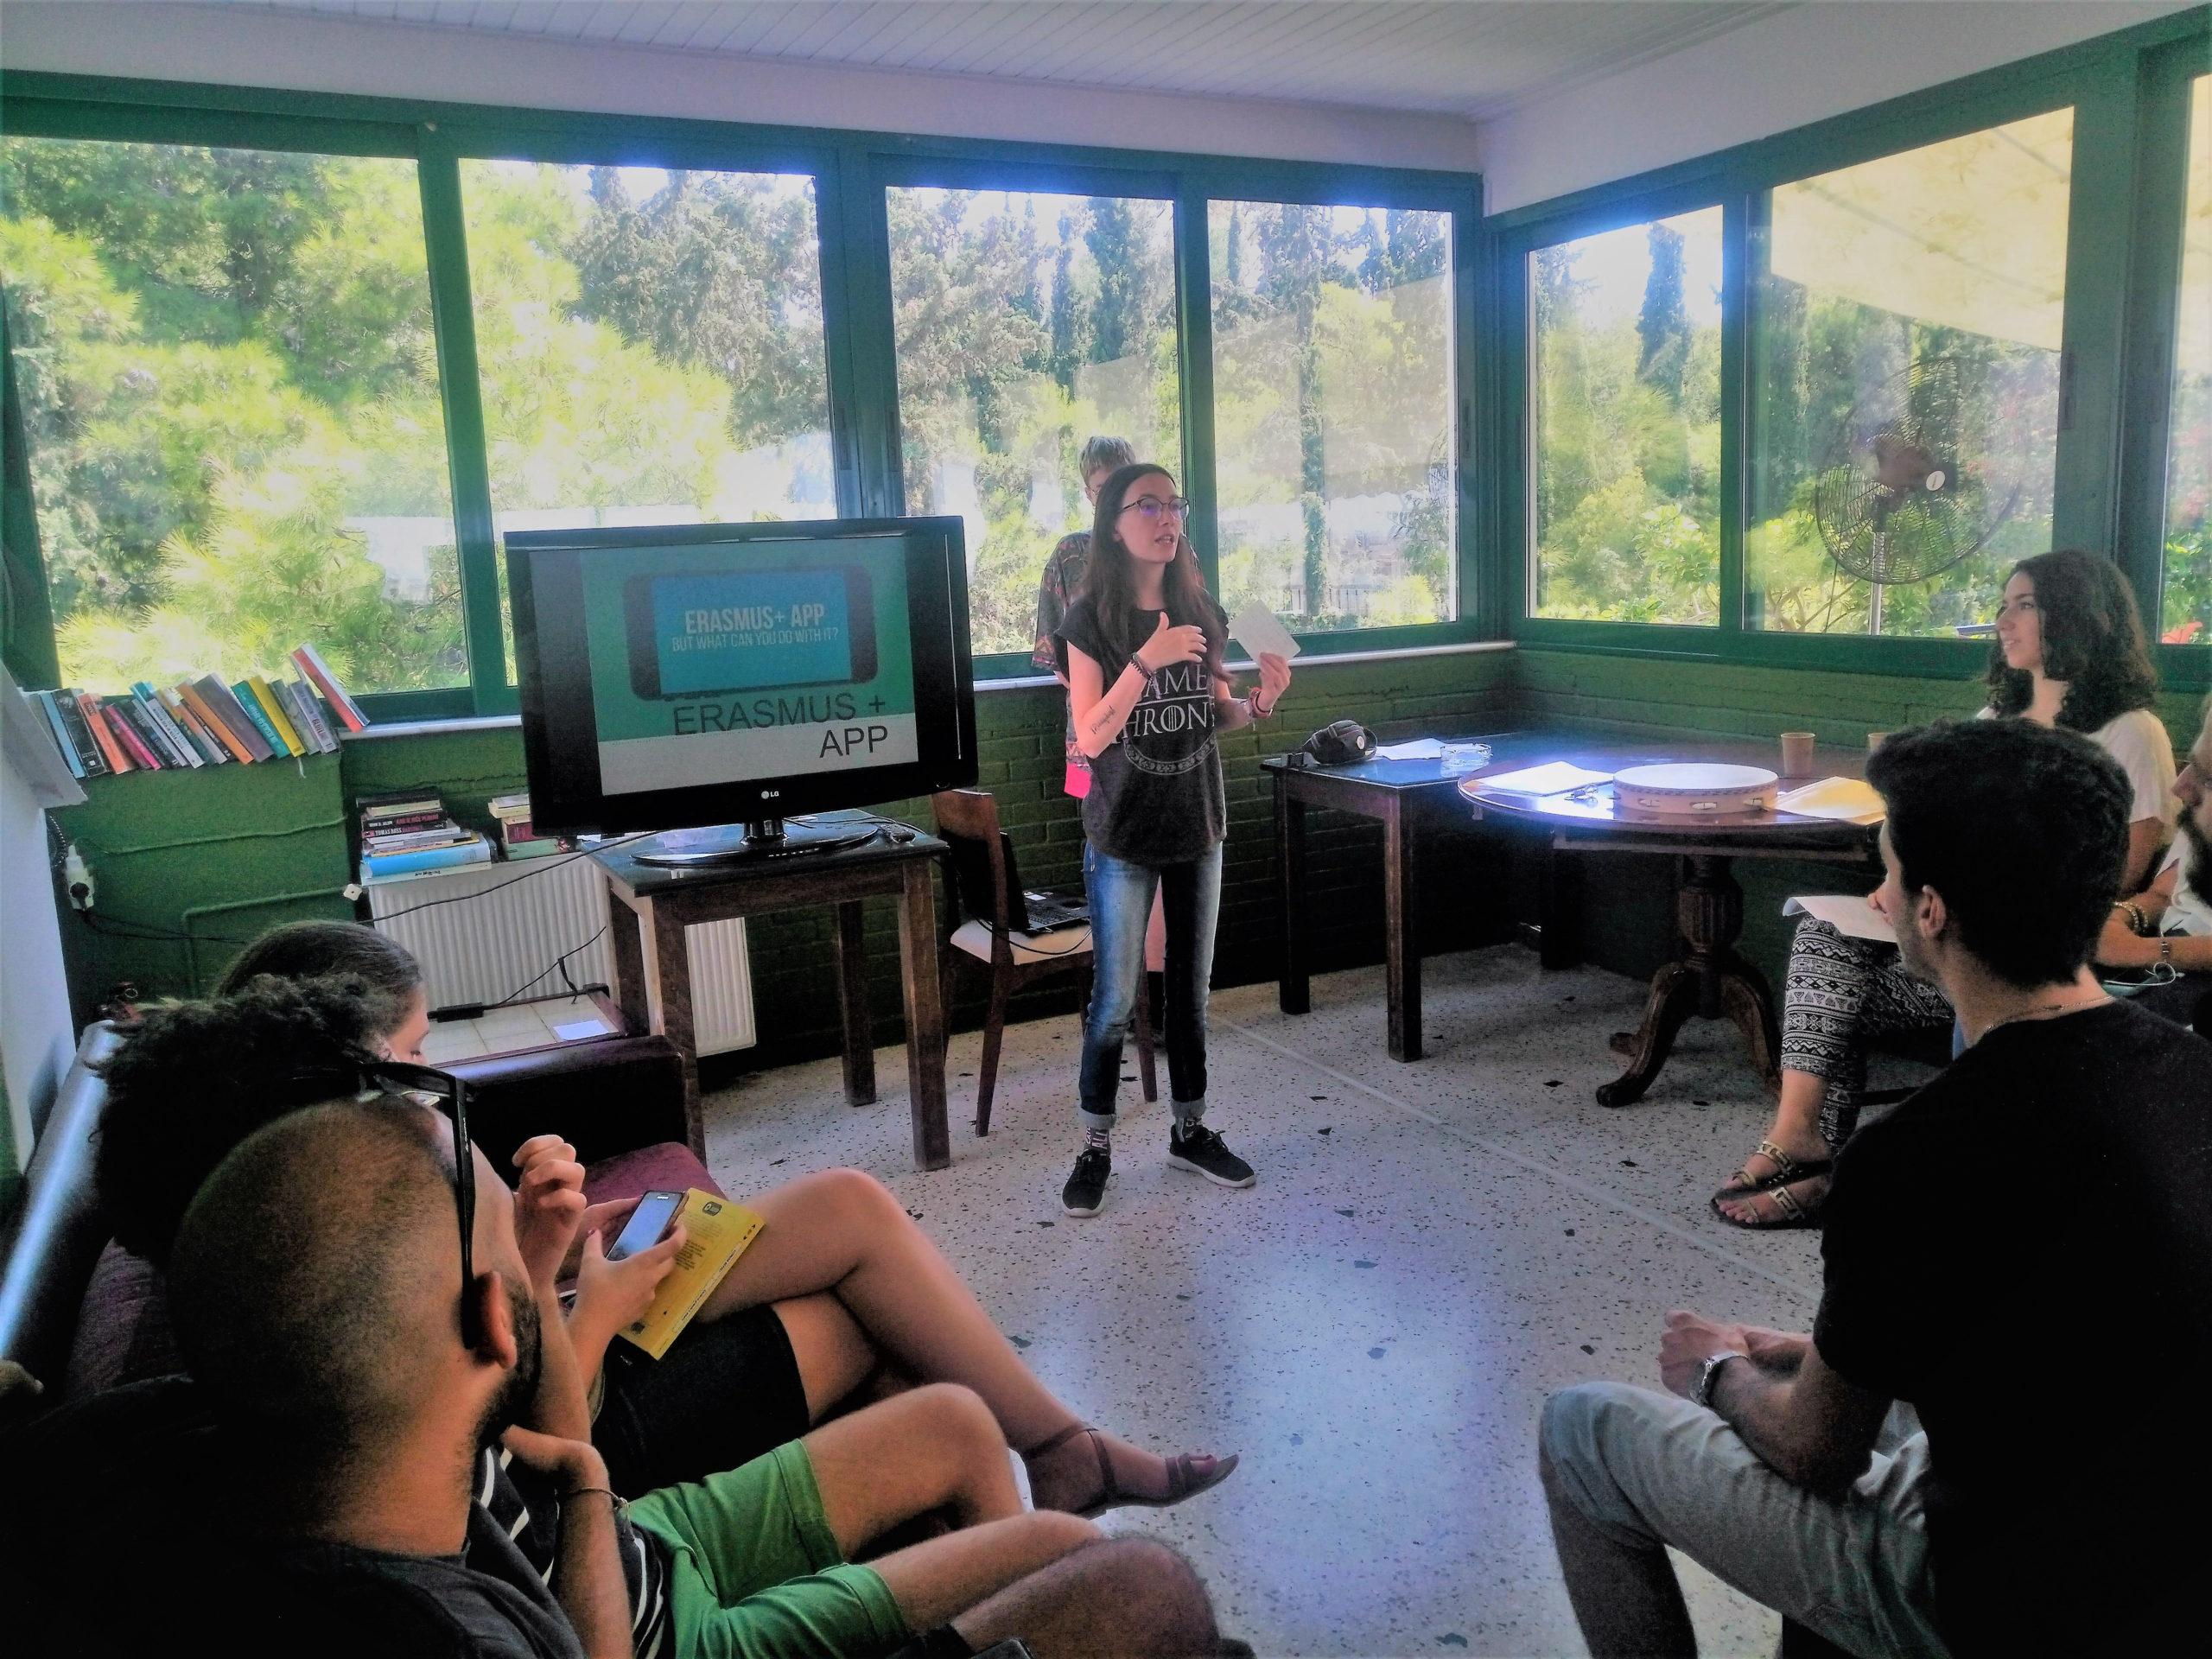 Presentation of the Erasmus + App by members of the Spanish team 1